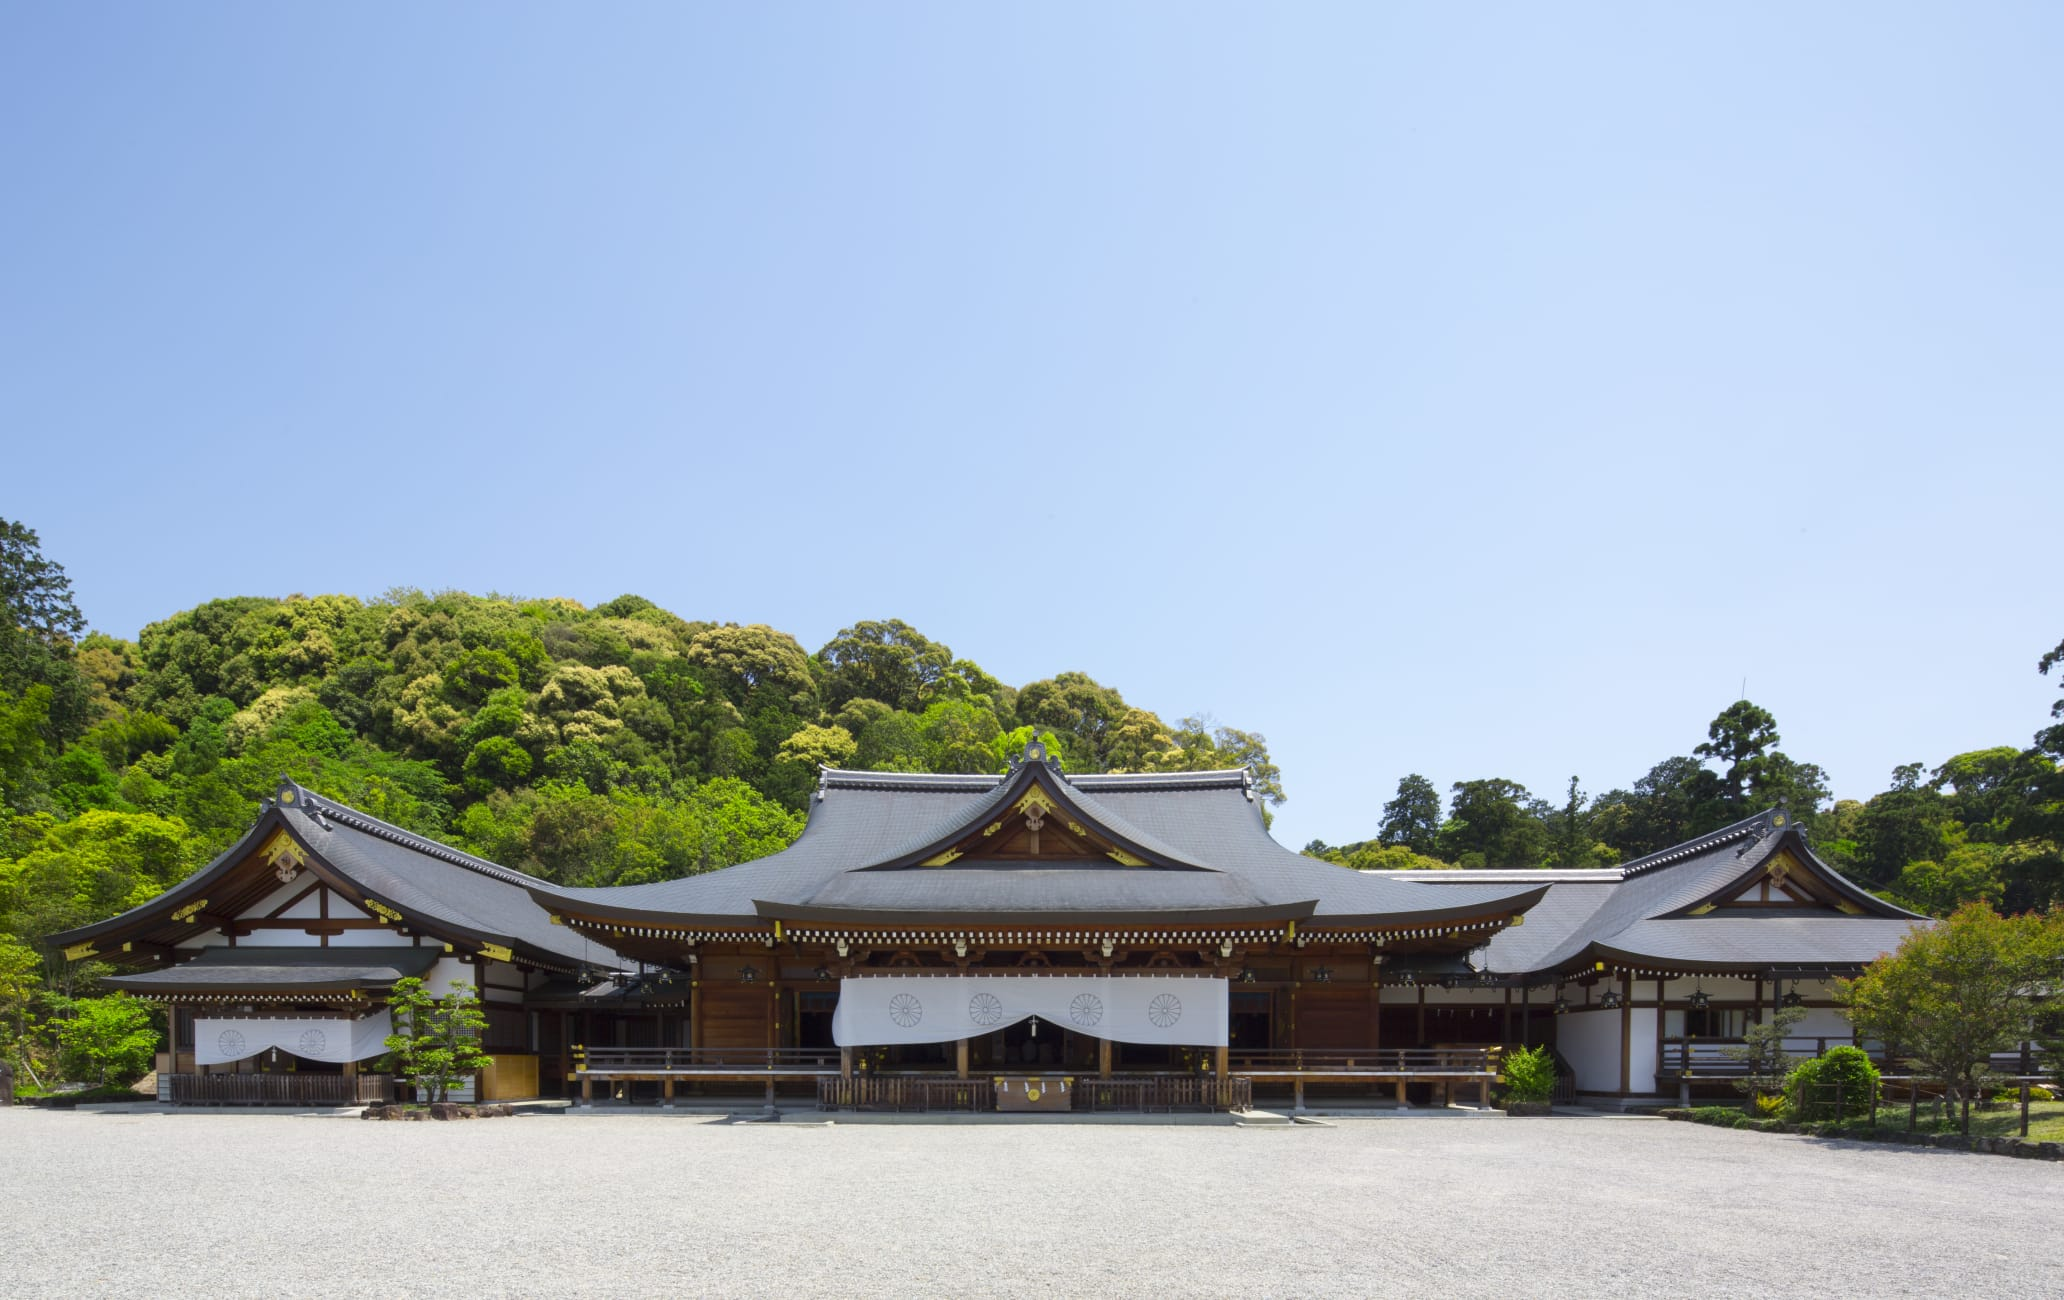 O-miwa Shrine